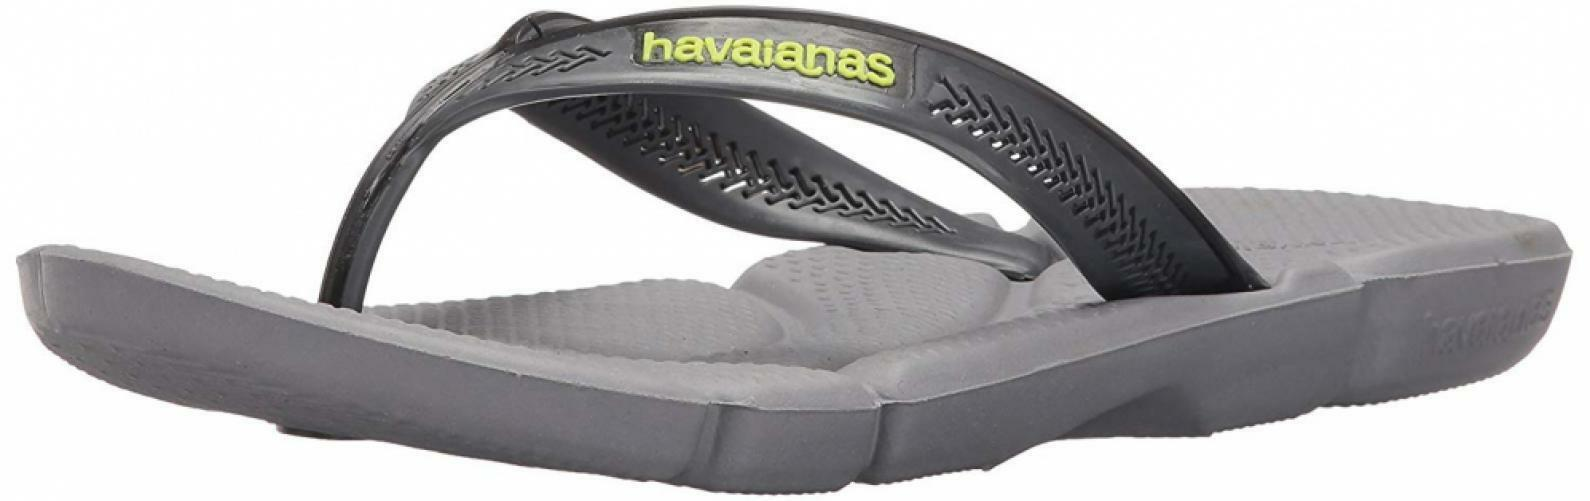 Havaianas Men's Power Flip Flop Sandals Comfort Walking Thong Beach Summer shoes